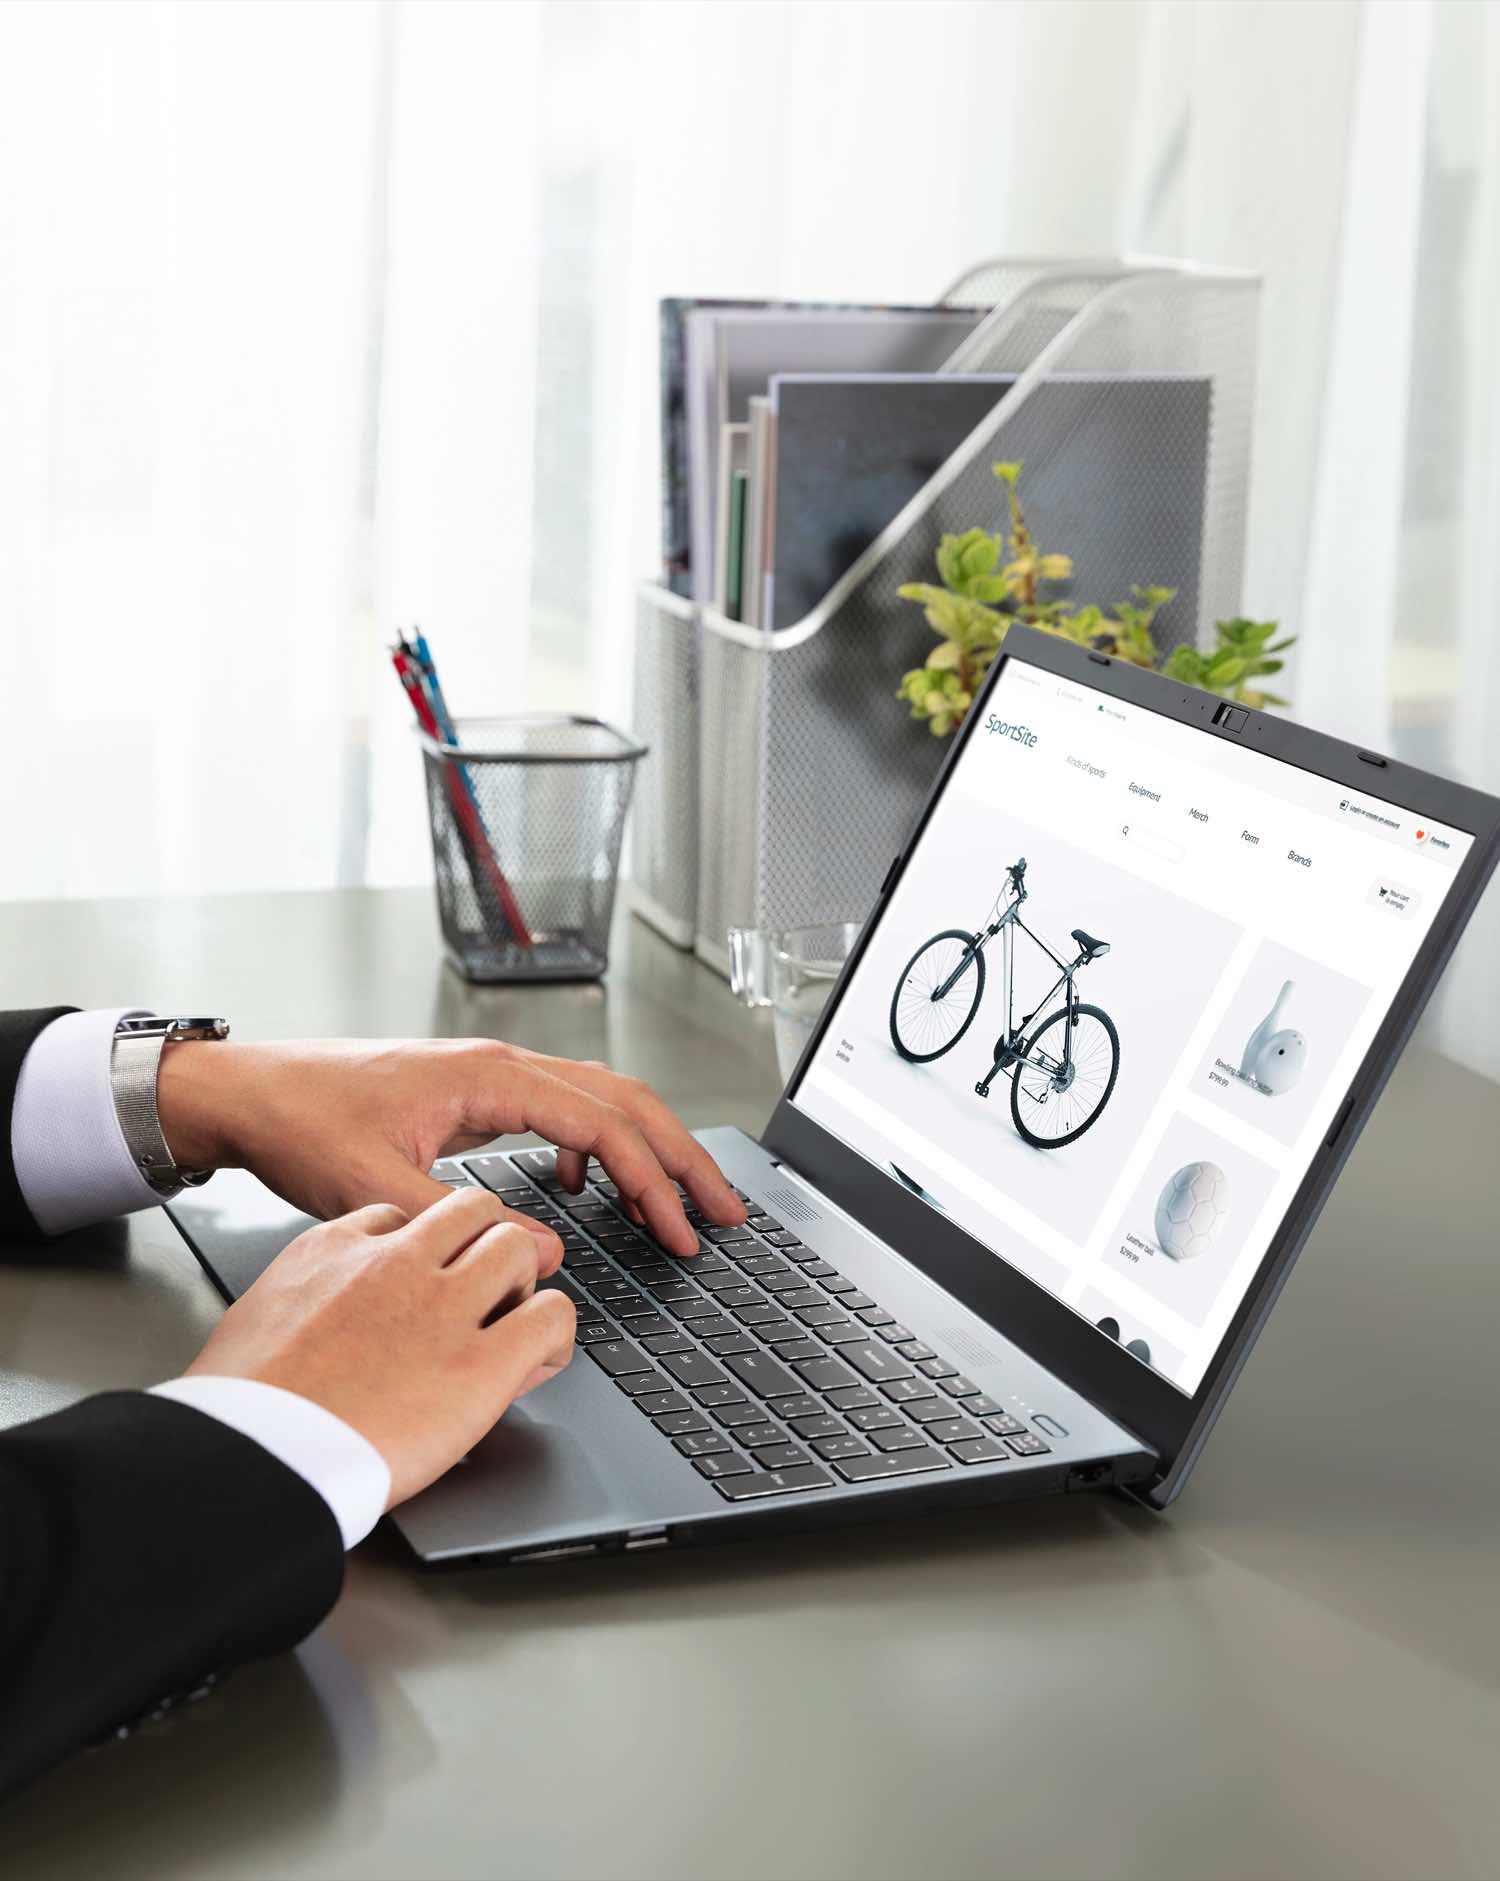 VAIO FE 系列日系手提電腦  大屏幕纖巧機身方便拎出拎入